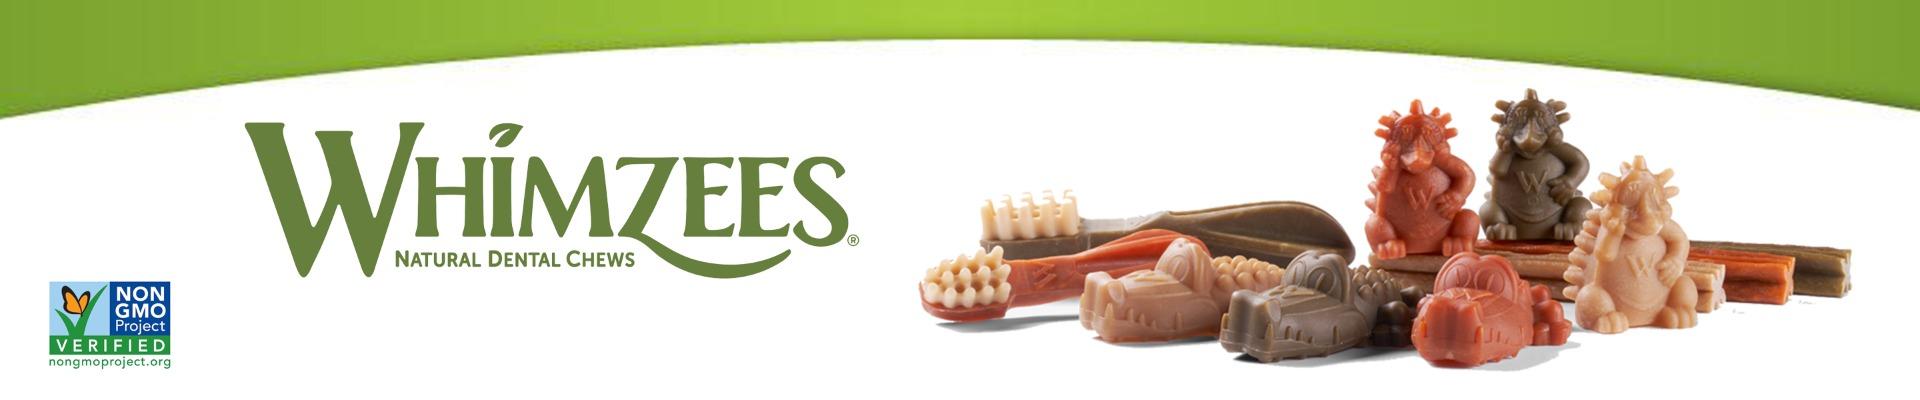 Whimzees vegetariska tuggben banner